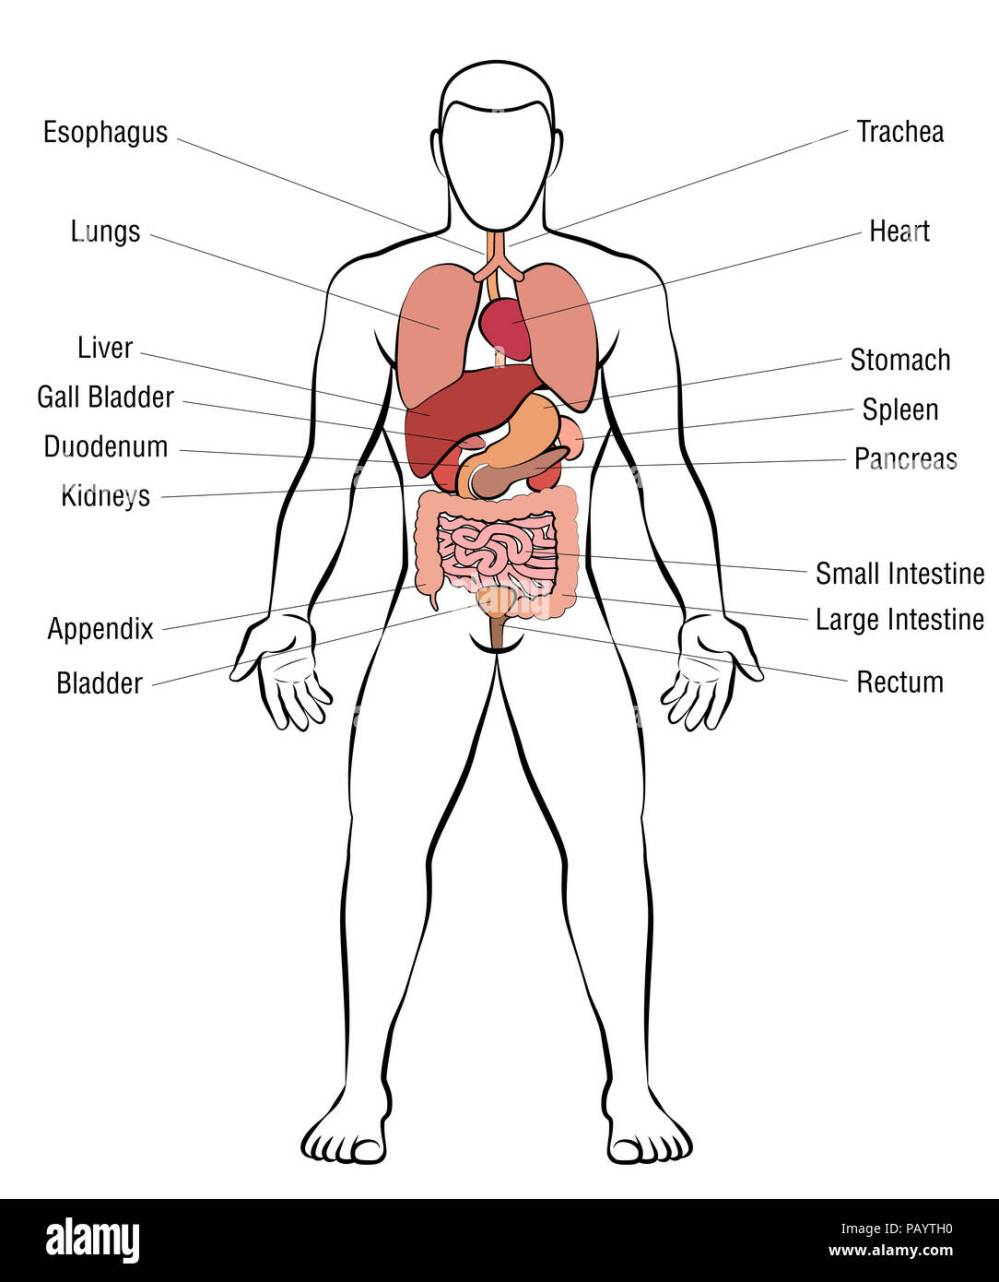 medium resolution of internal organs male body schematic human anatomy illustration on white background